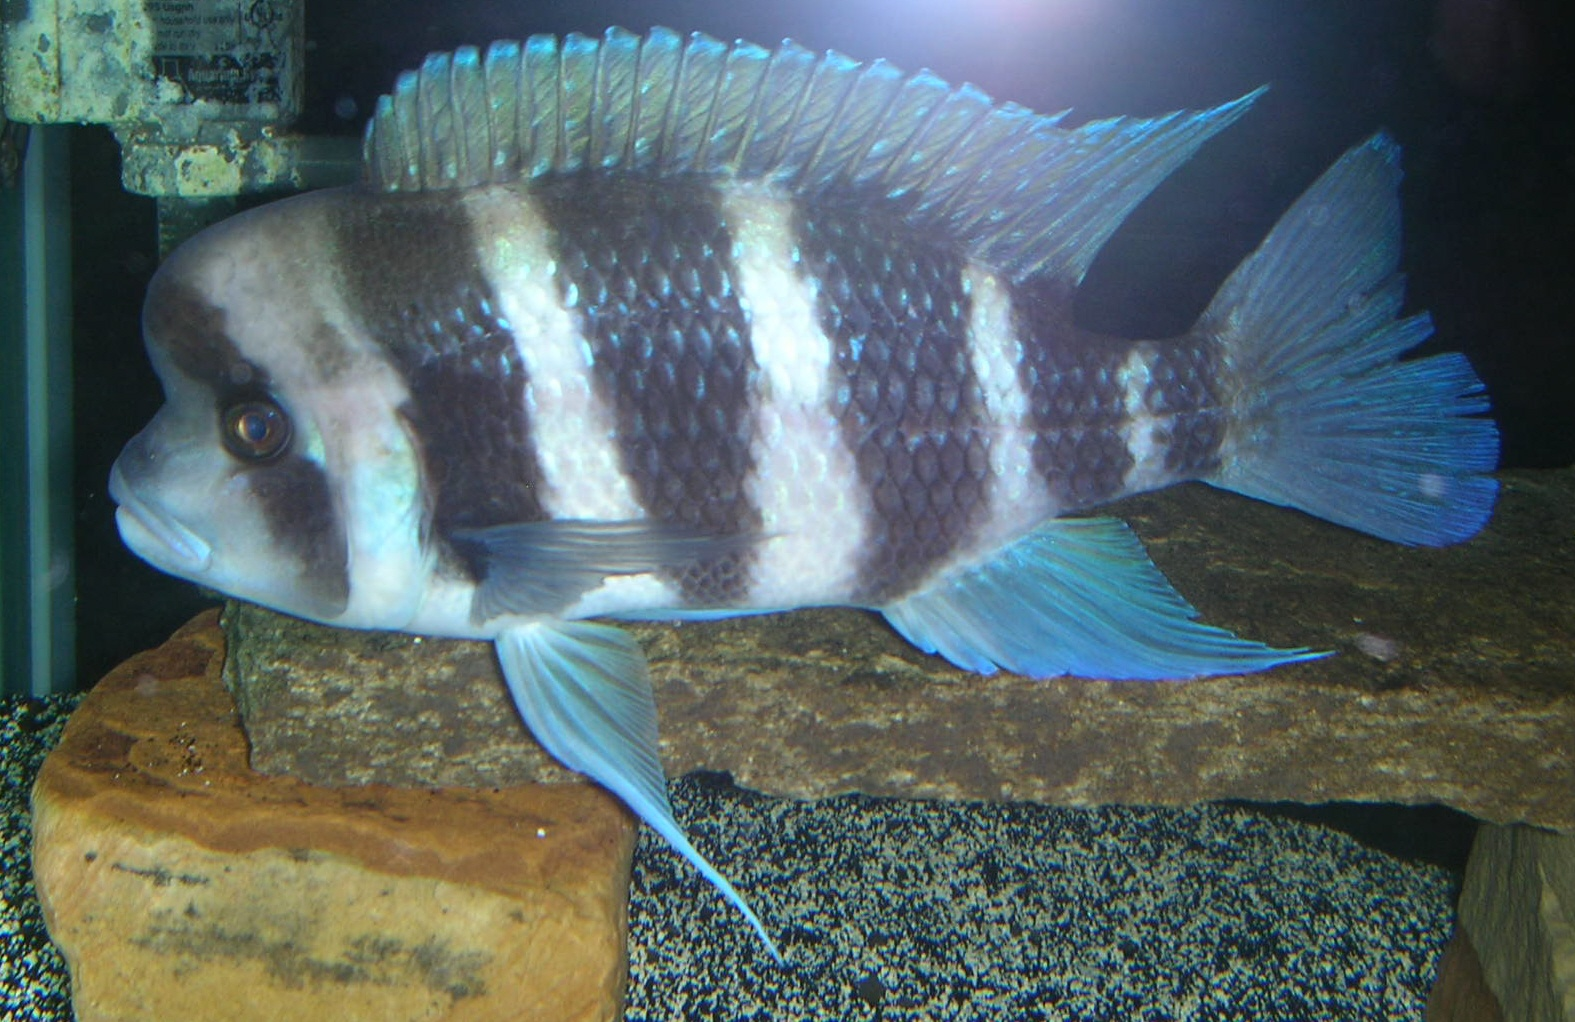 cichlids.com: Frontosa (Burundi variant)